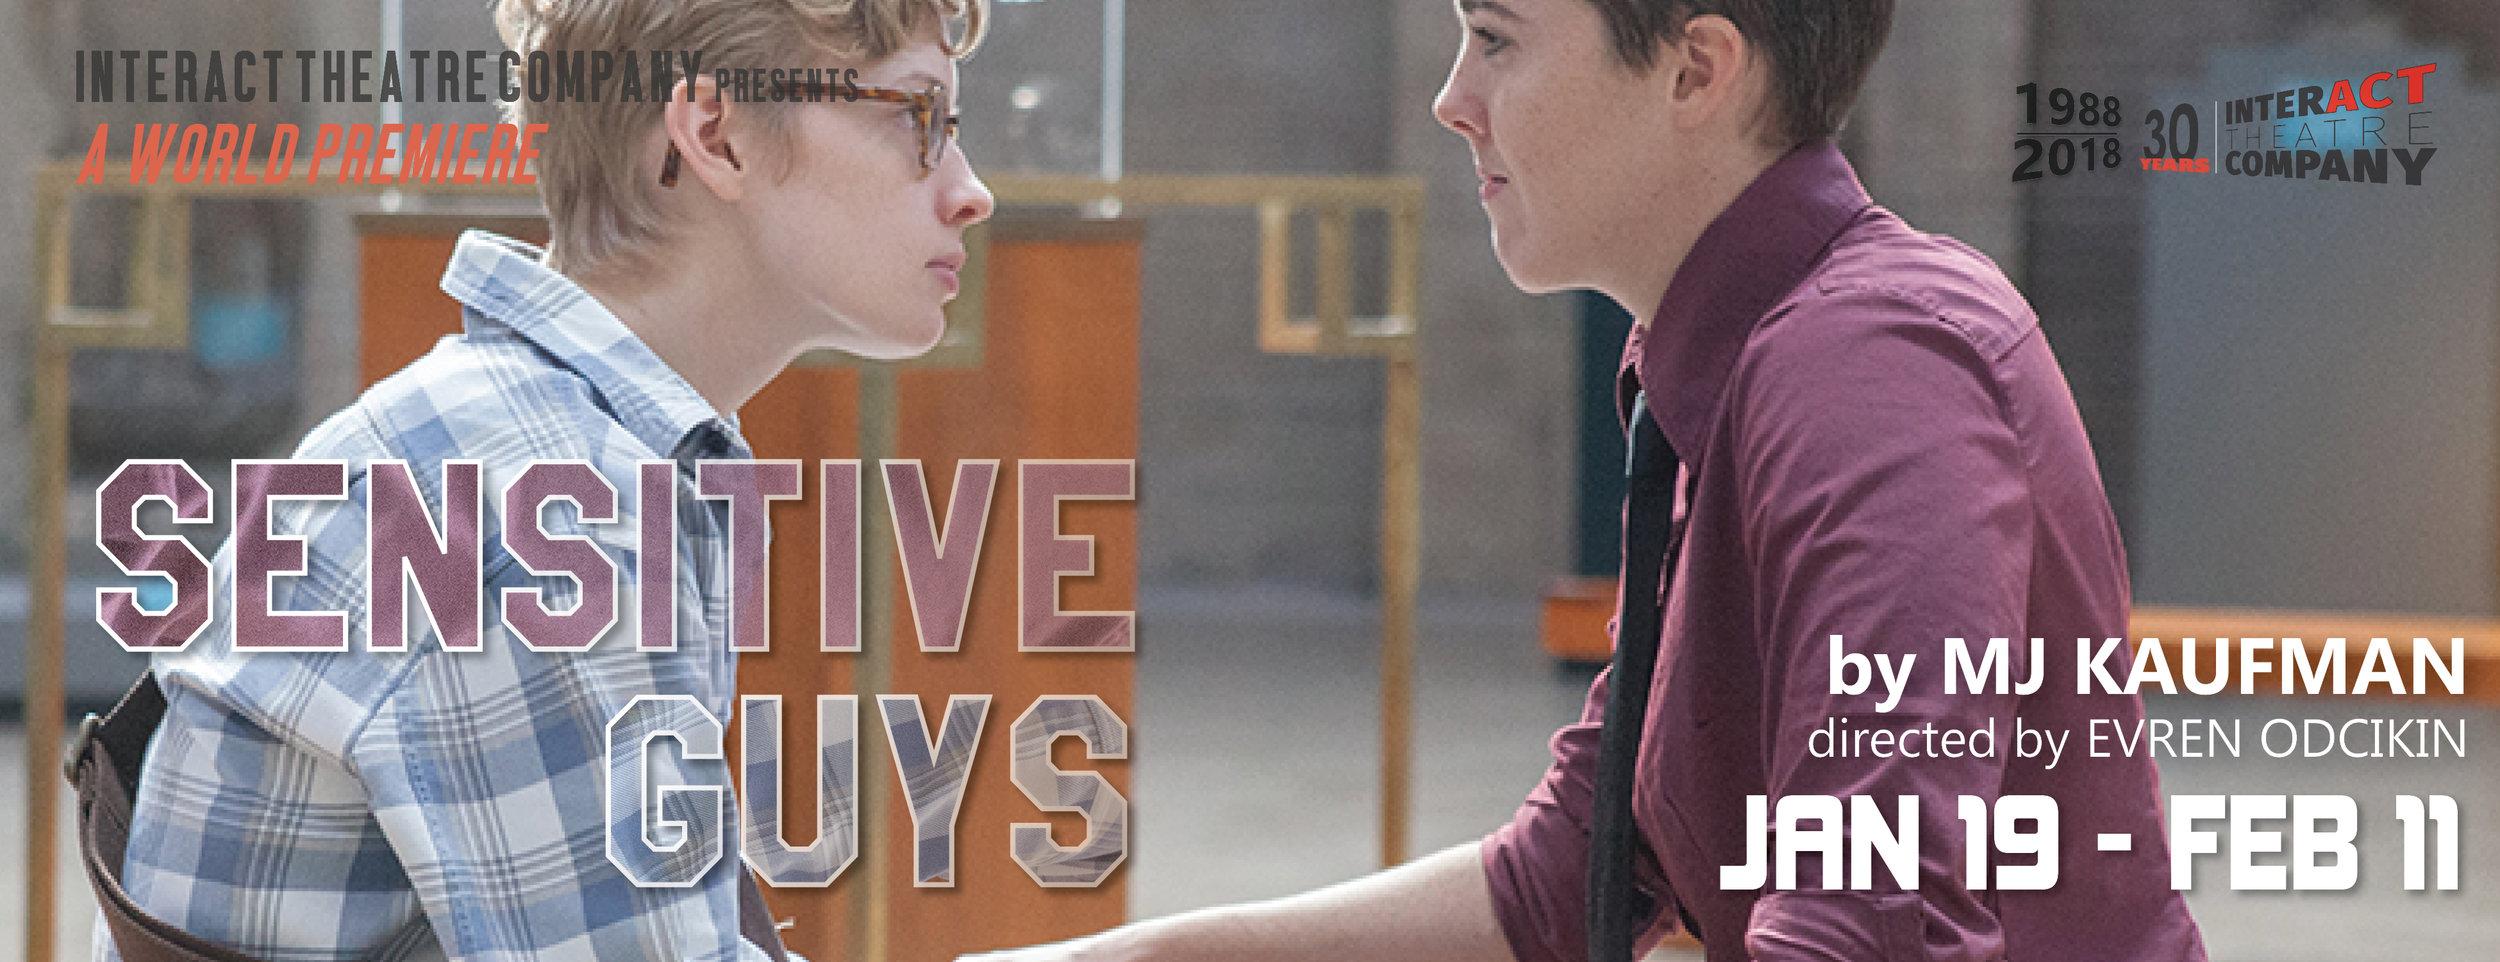 SENSITIVE GUYS by MJ KAUFMAN - January 19 - February 11